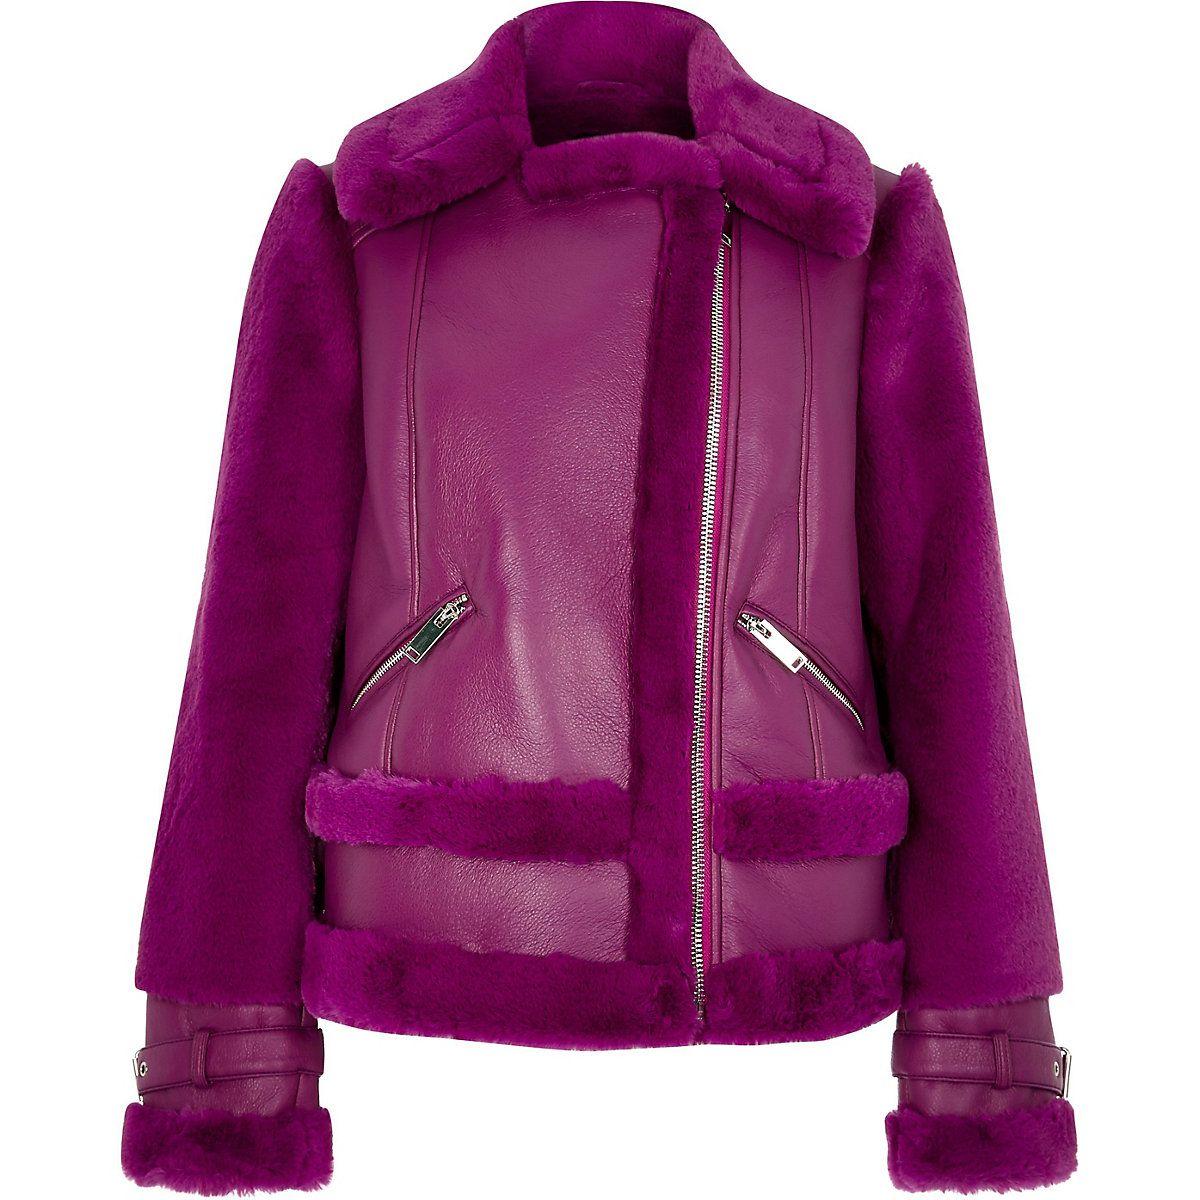 Purple faux fur aviator jacket Jackets, Aviator jackets